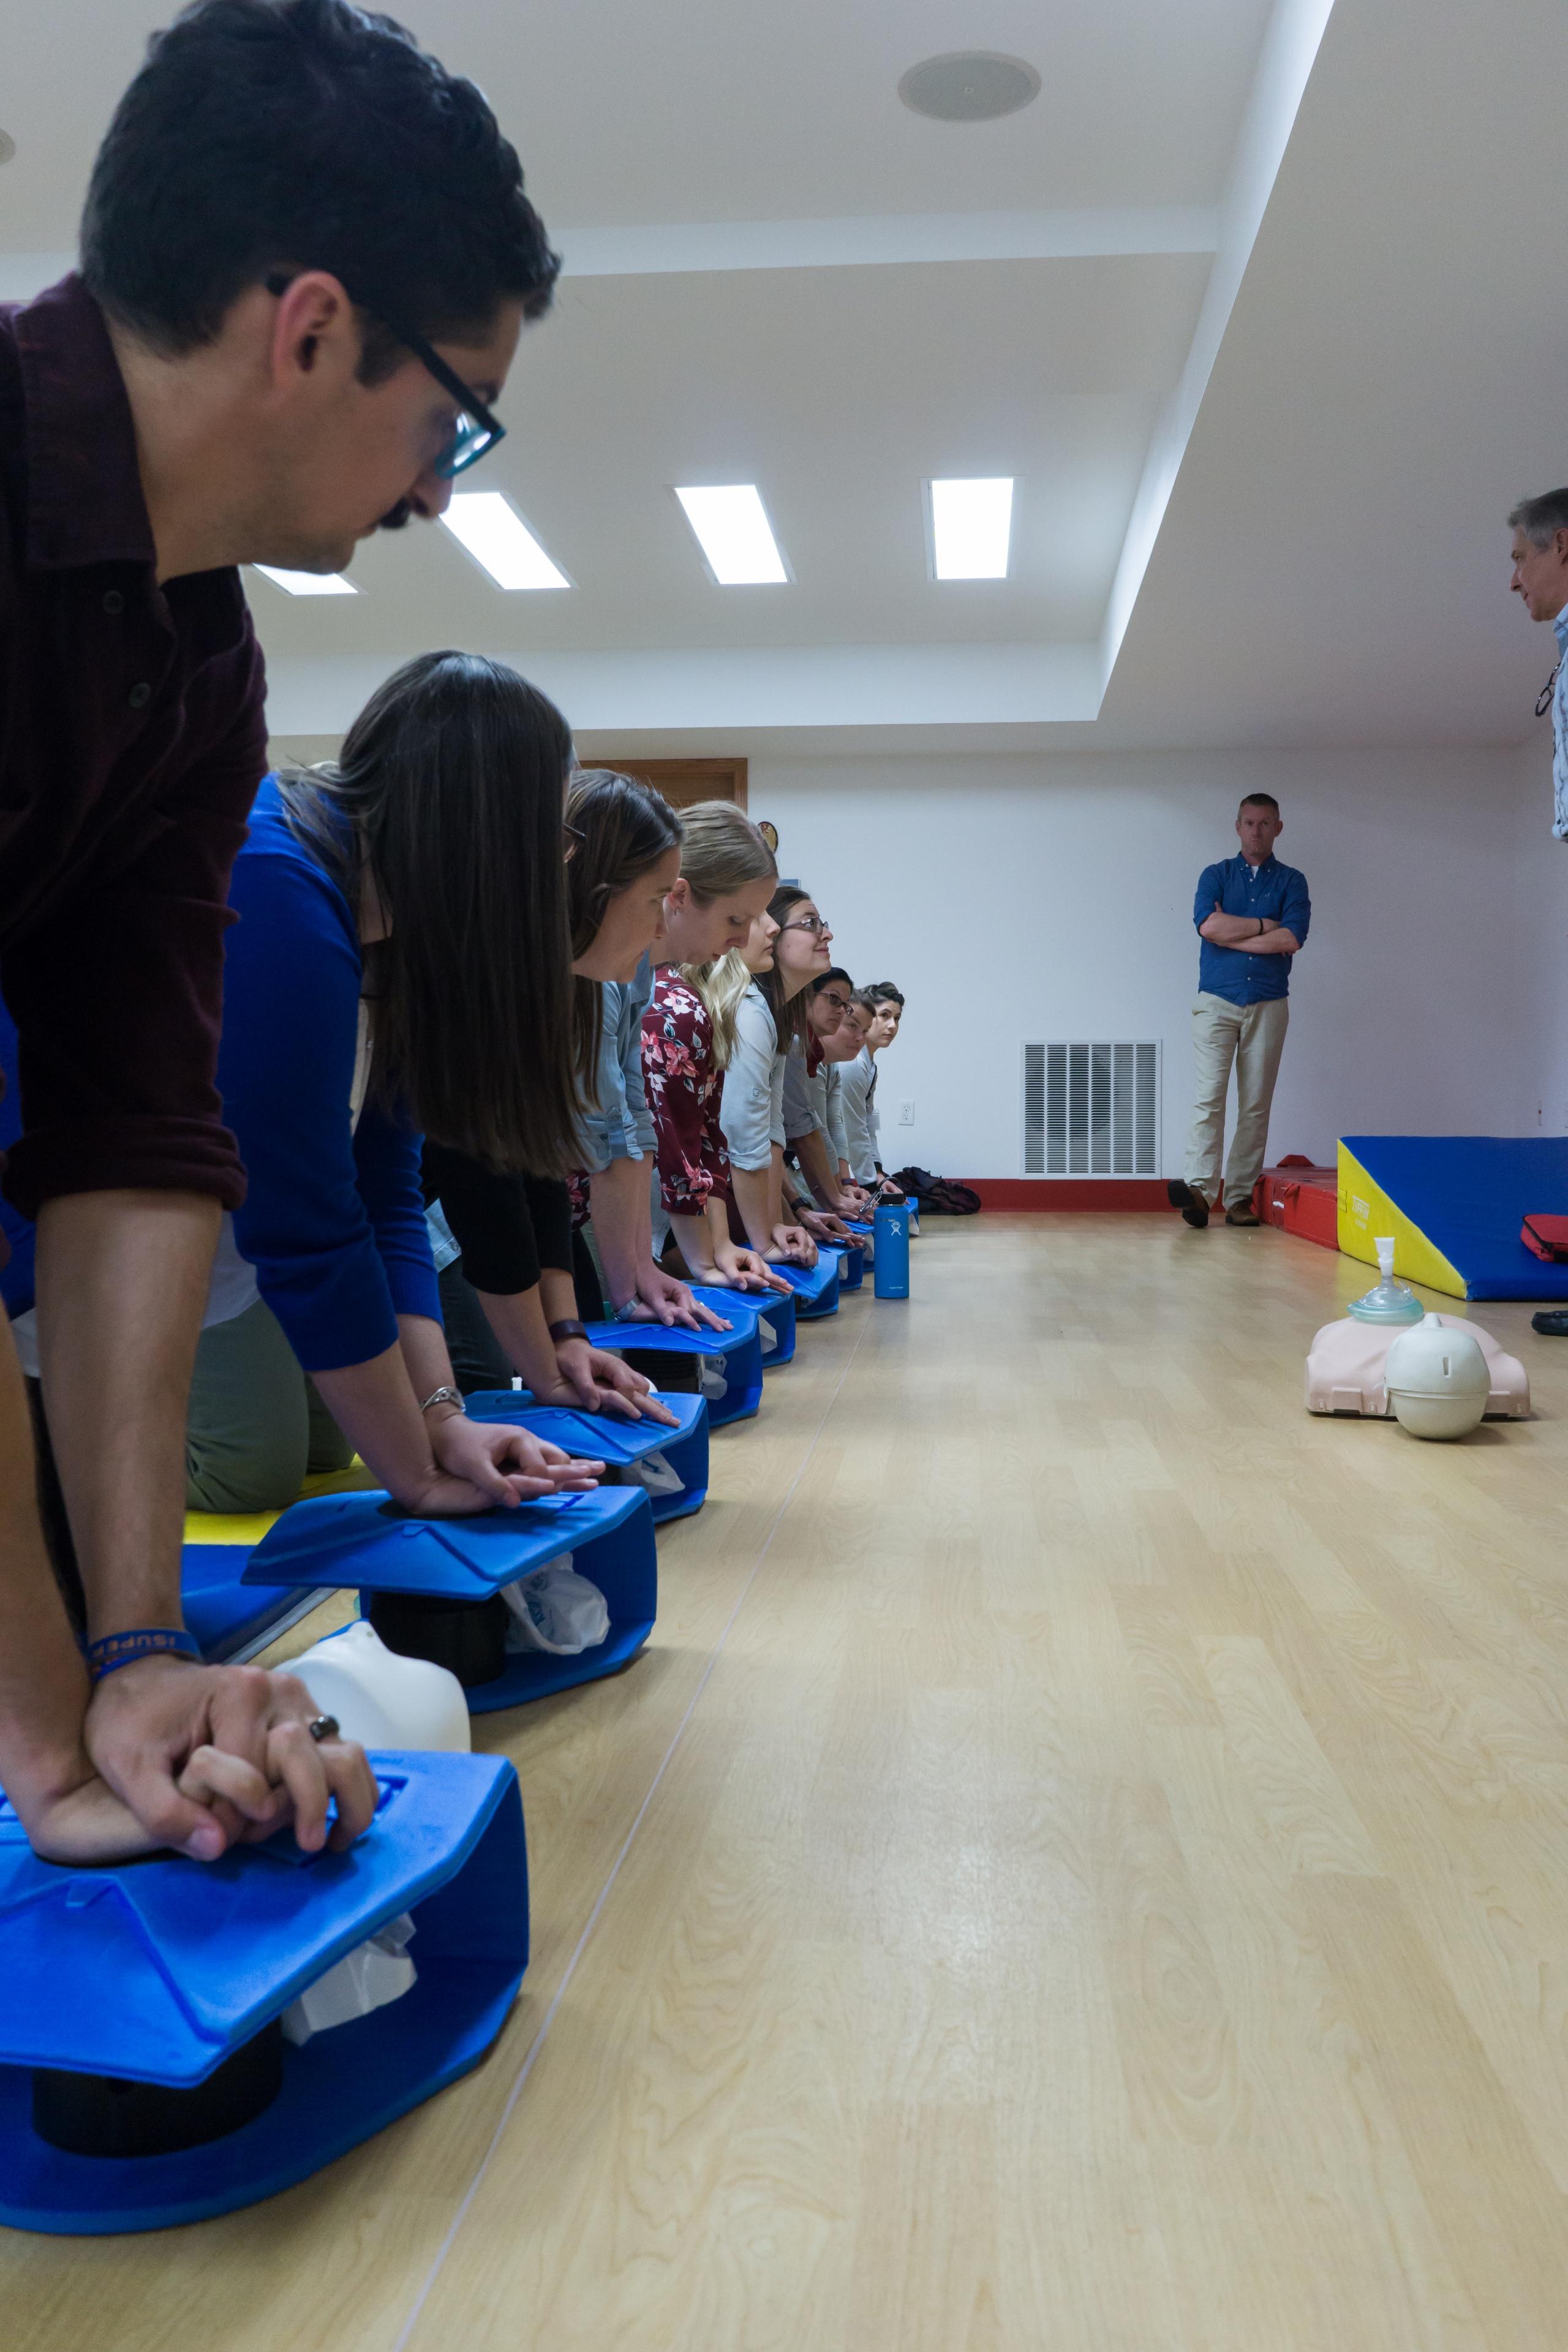 Cpr And First Aid Classes Sun Prairie Pulse Check Plus Llc